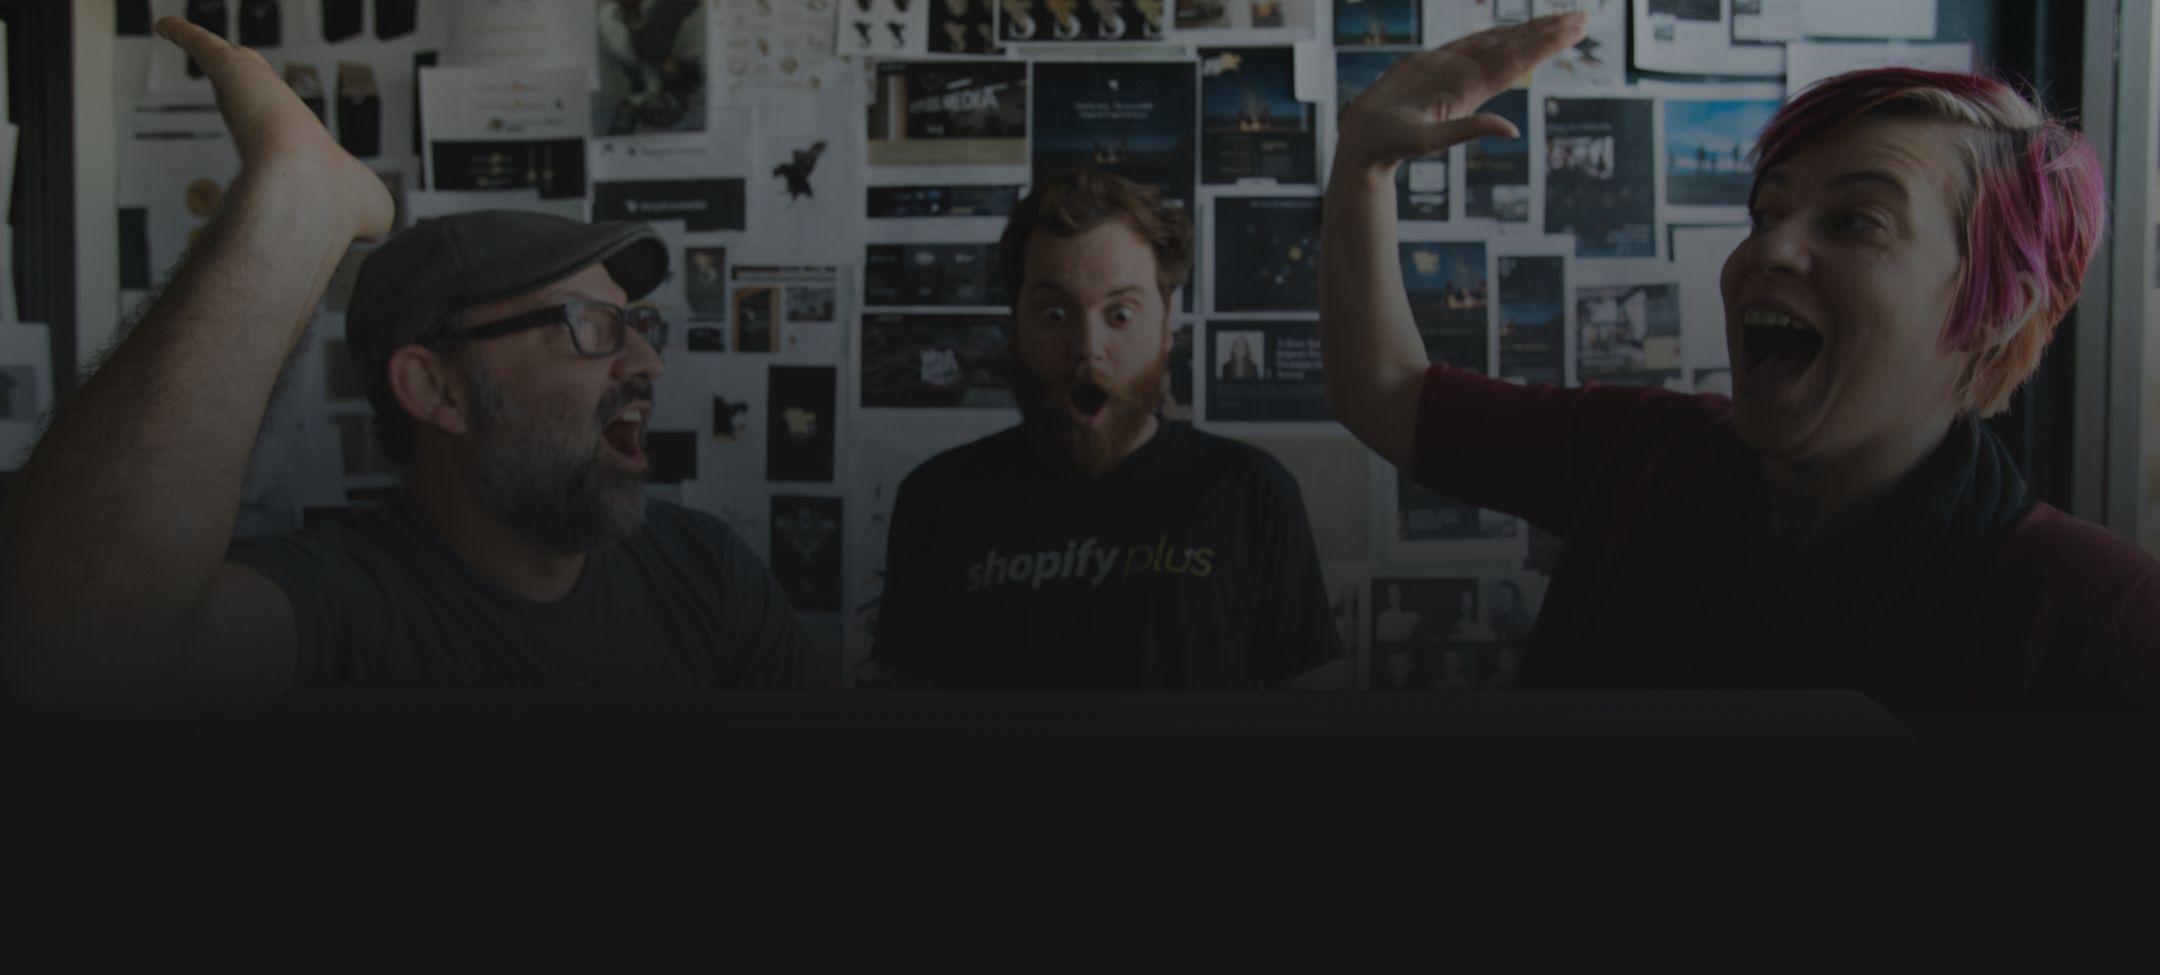 Clutch - Top Shopify Developer